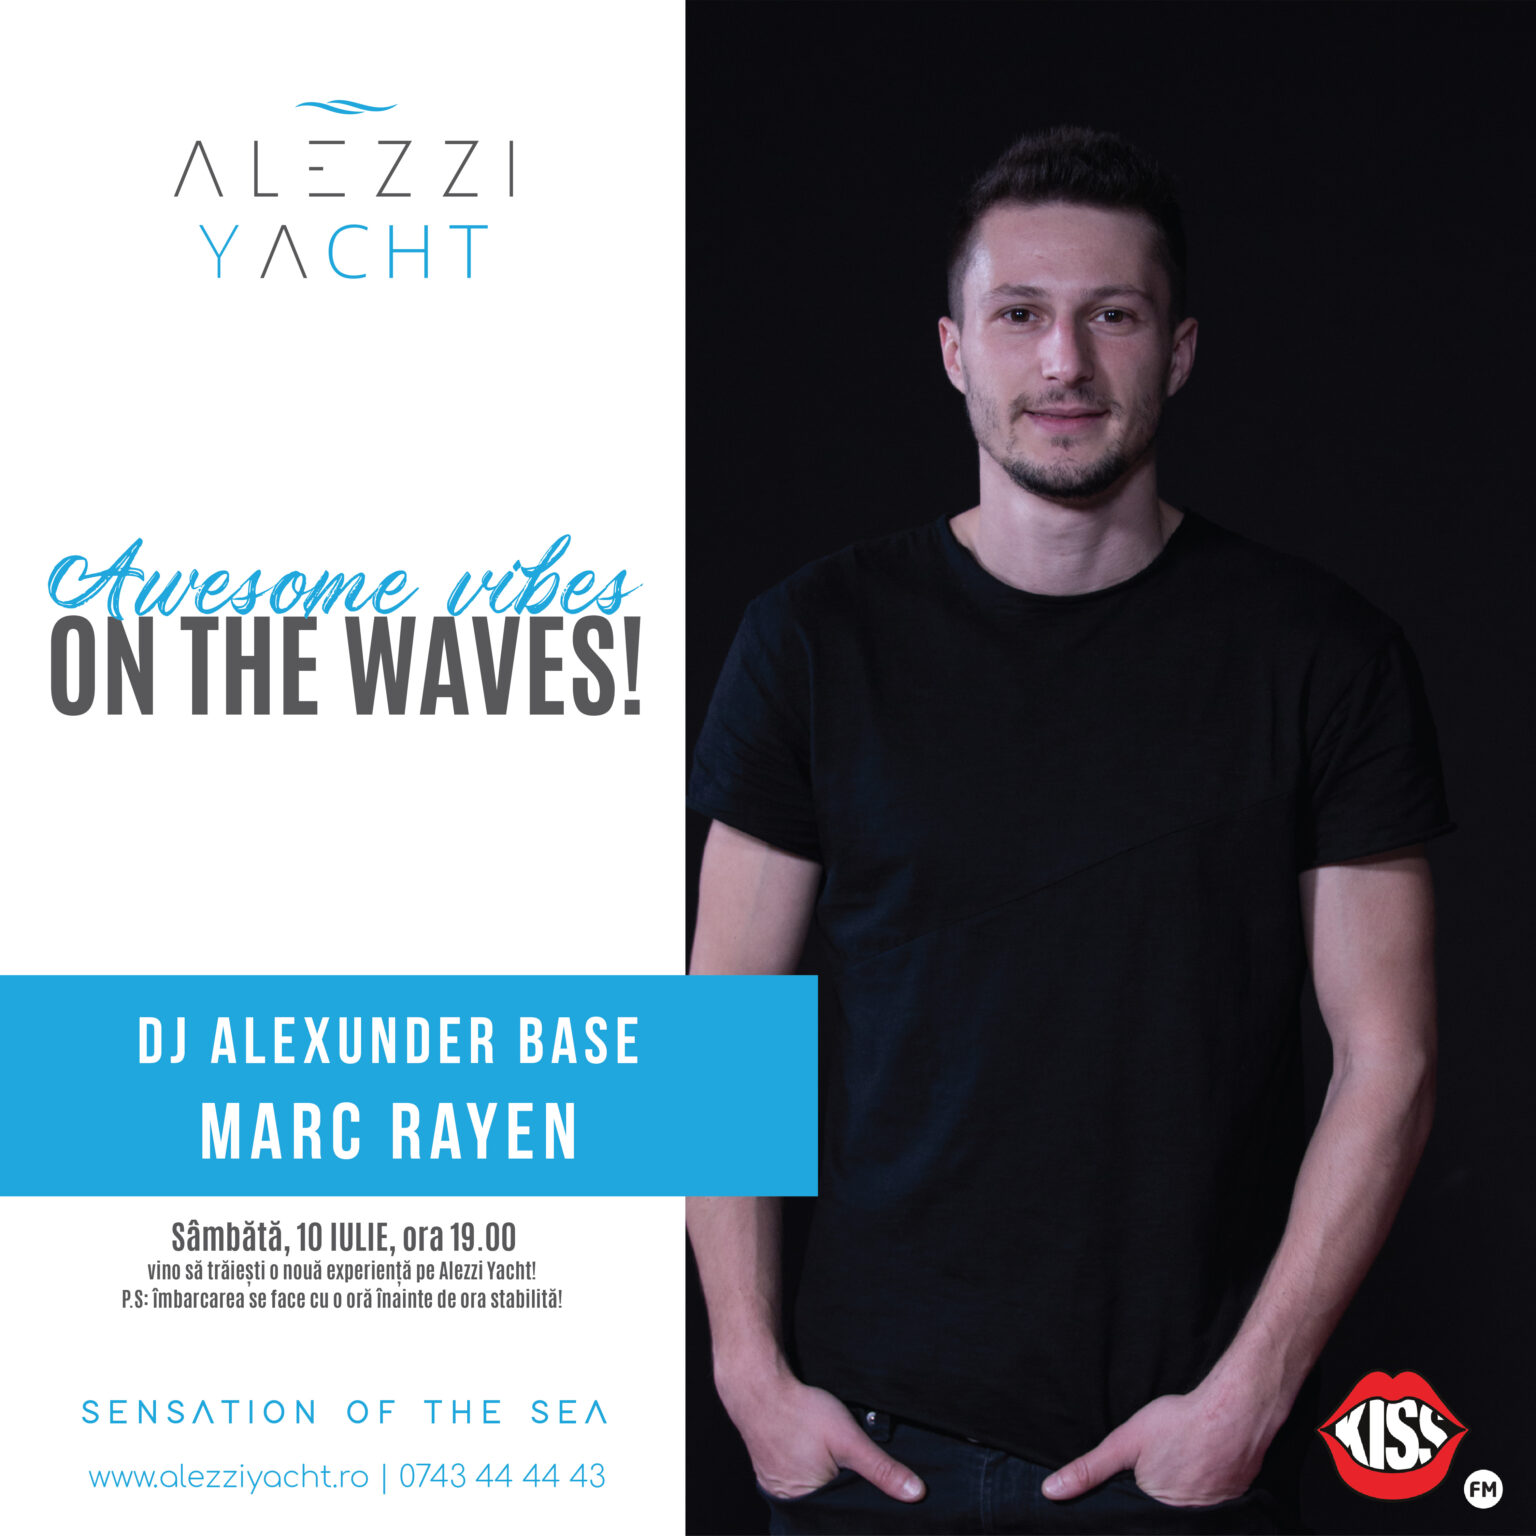 MARC RAYEN on the waves